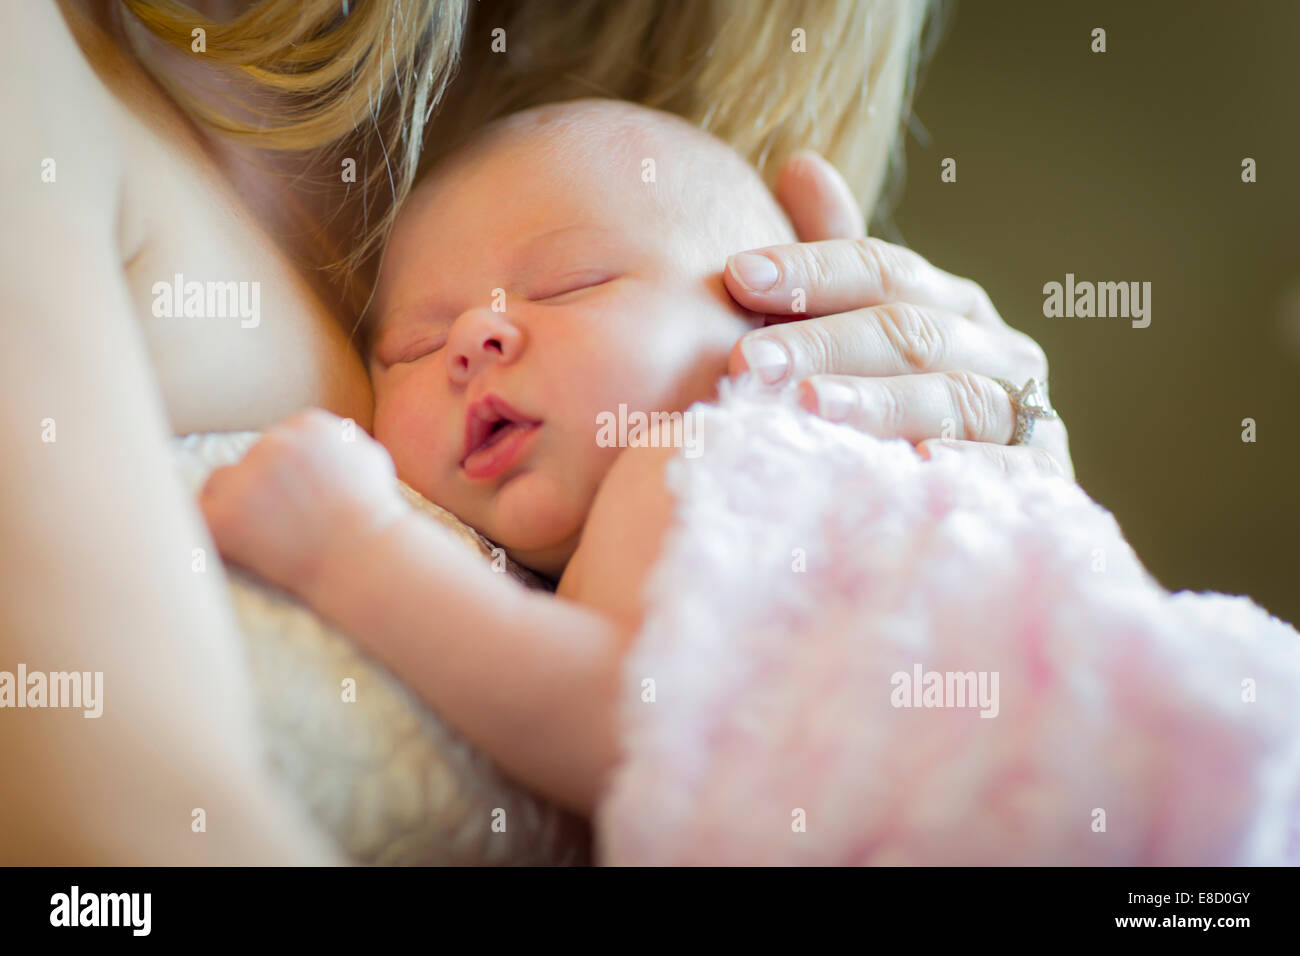 Gentle Hands of Mother Holding Her Precious Newborn Baby Girl. - Stock Image